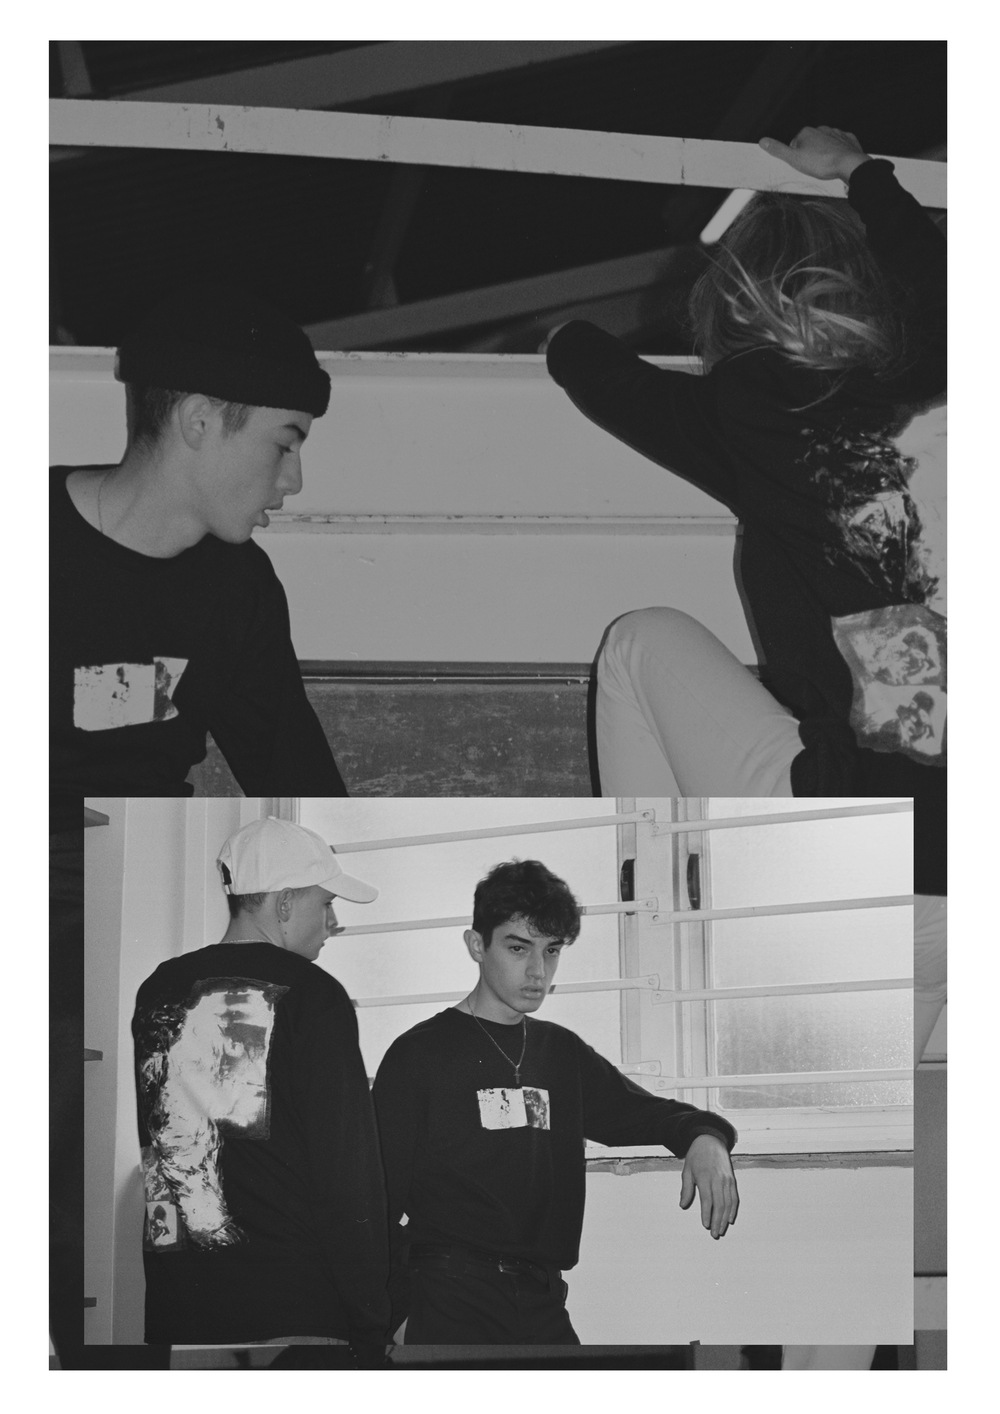 Models Tabbie Brewer (@tabbiebrewer), Jay Izzard (@jayizzard) and Ibrahim McGinty (@ibrahim_mcginty)